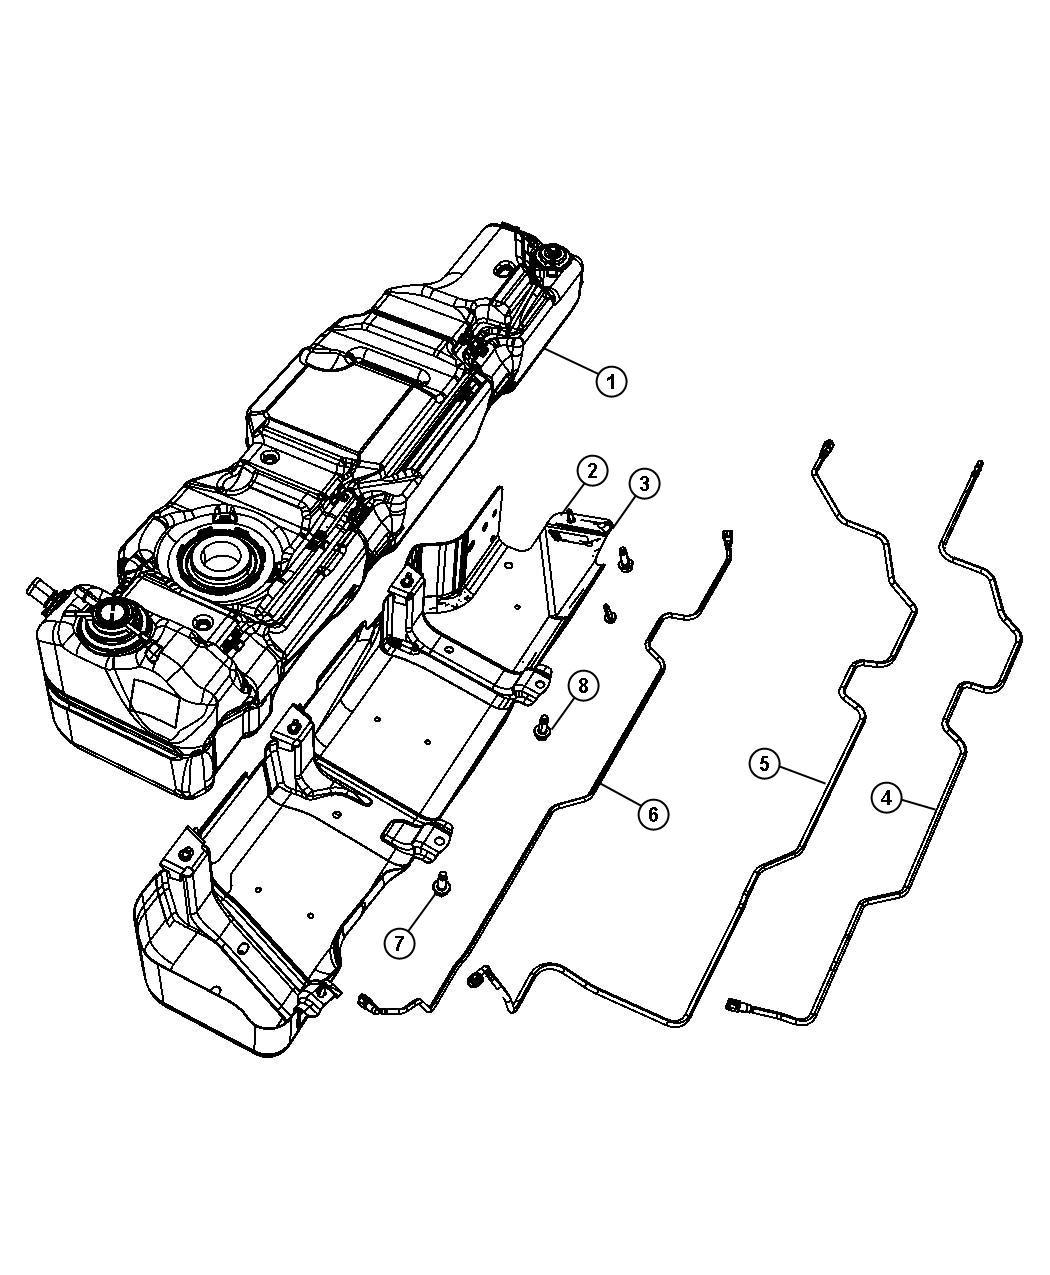 Jeep Wrangler Tank Fuel Nf3 17 6 Gallon Module